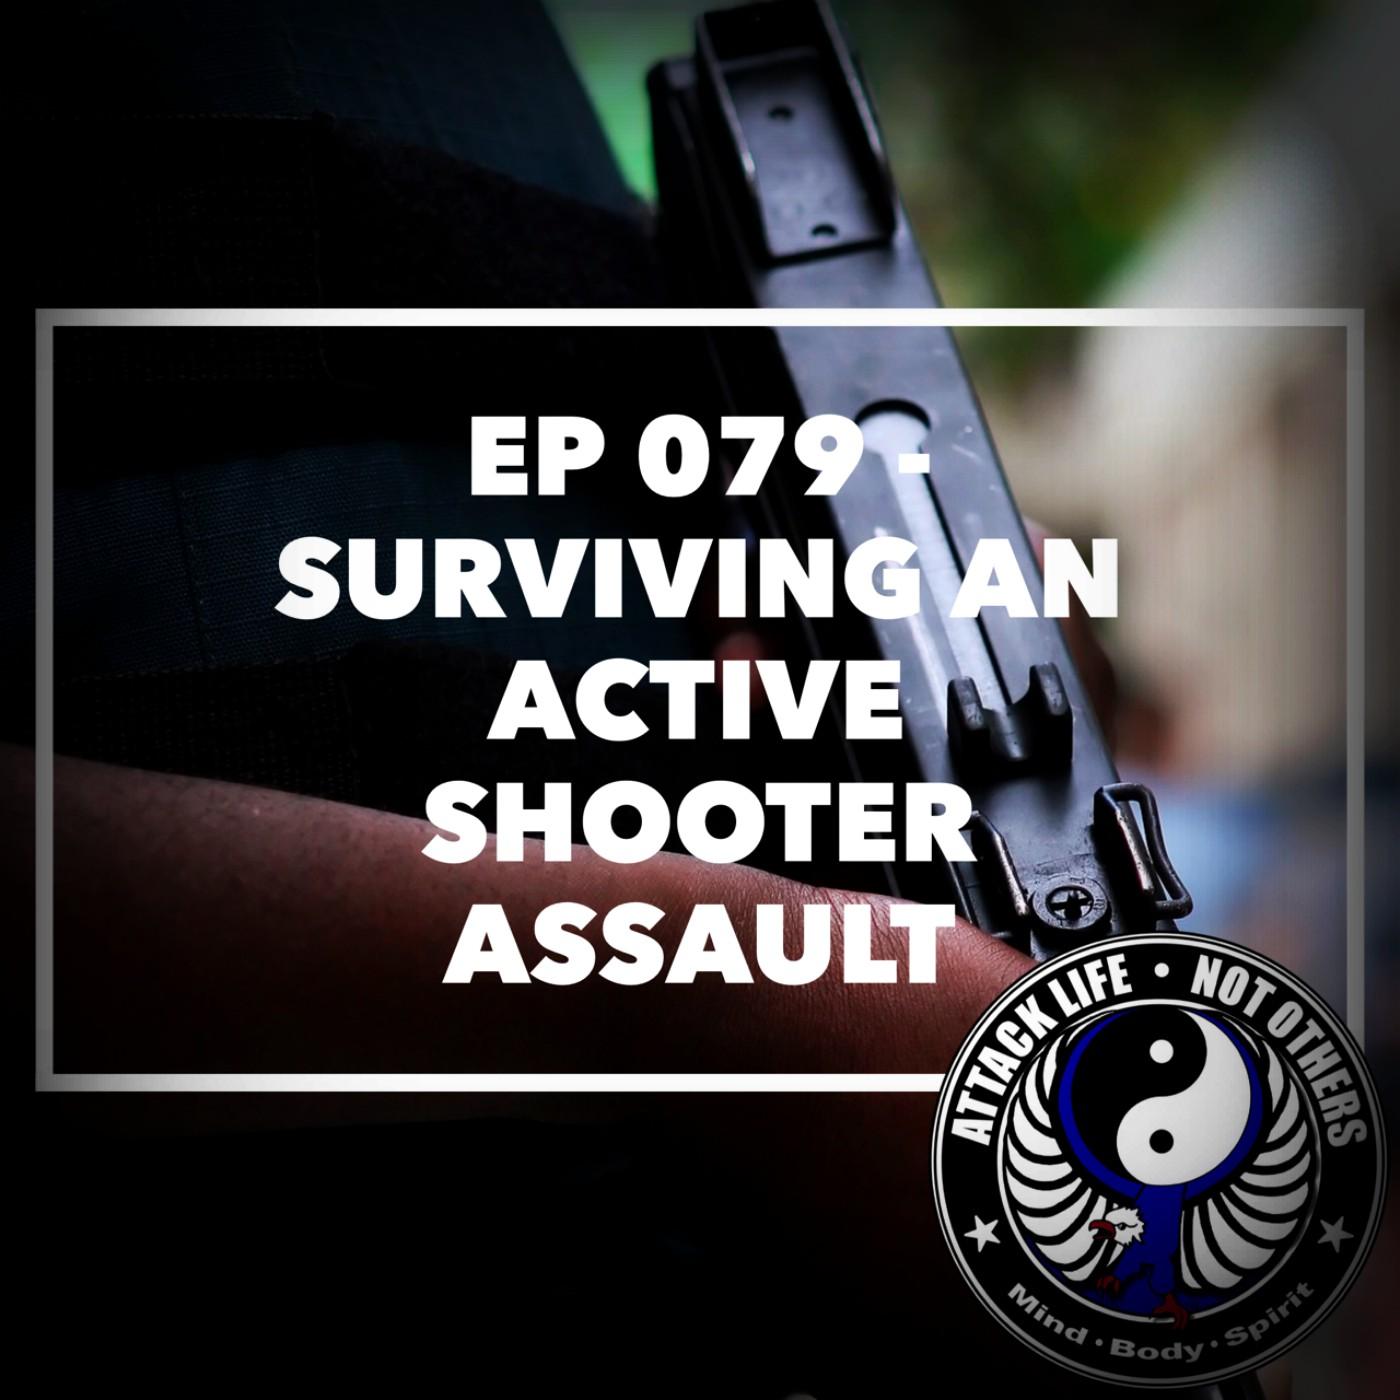 Ep 079 - Surviving an Active Shooter Assault — Podcast